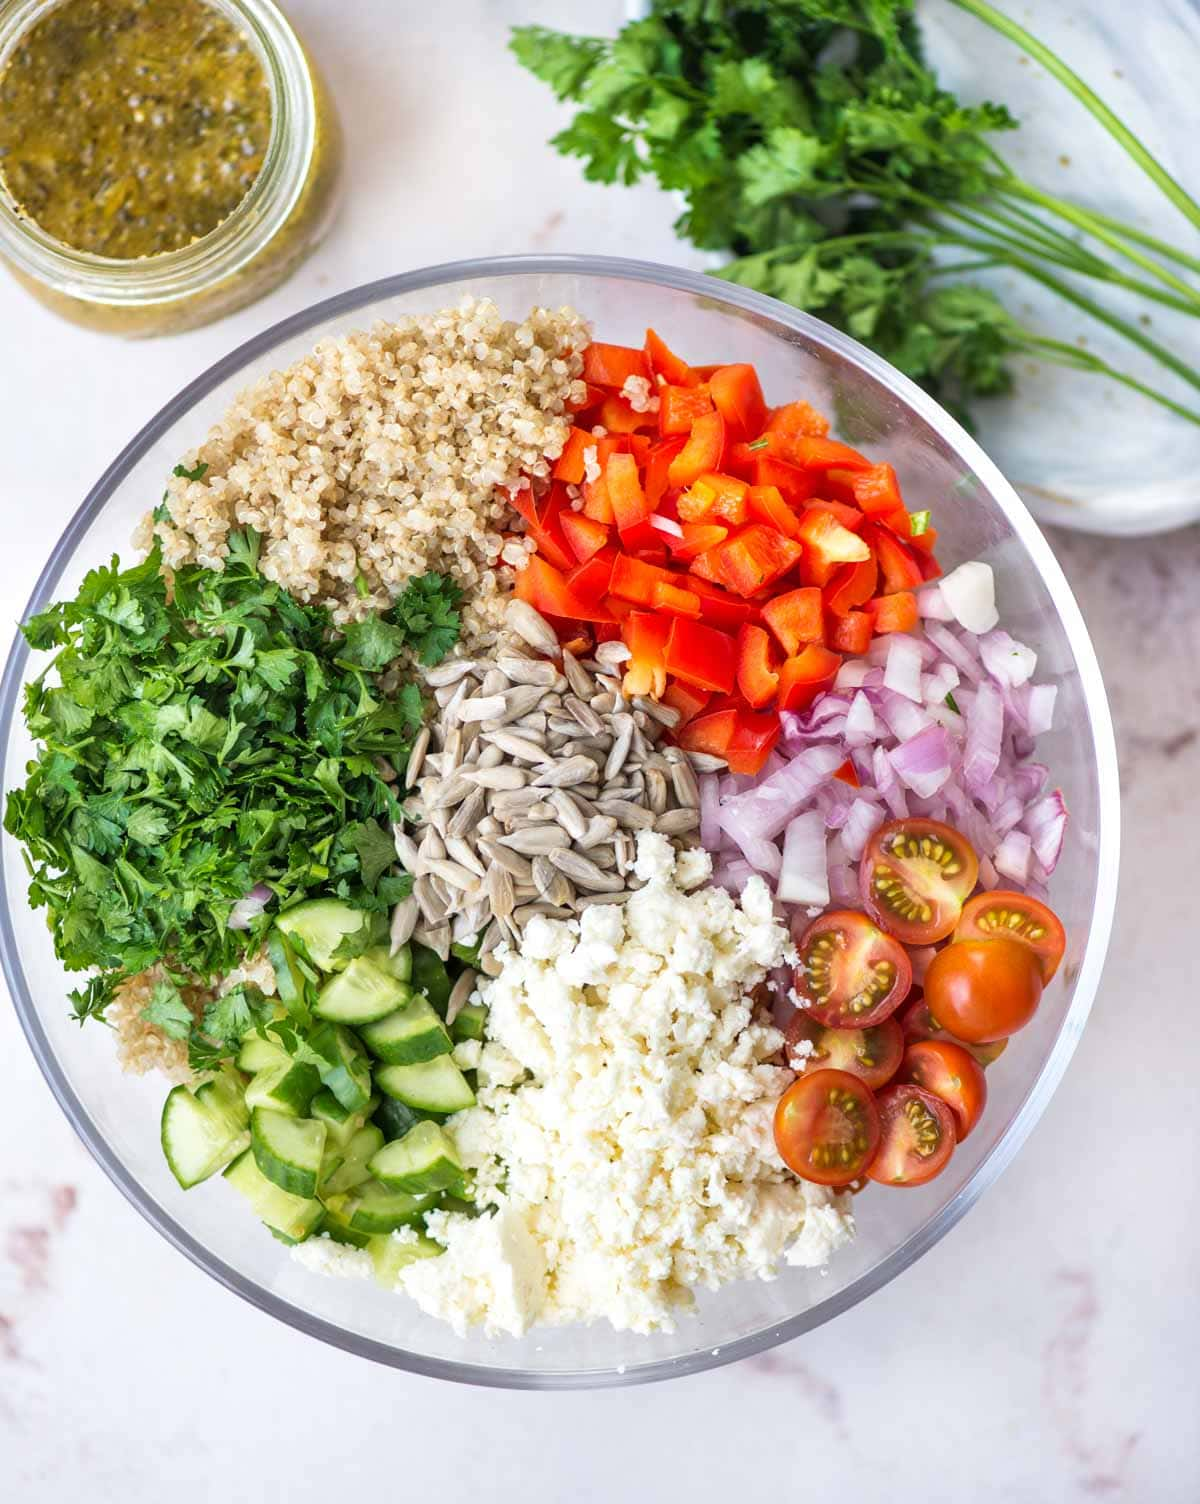 Ingredients required to make quinoa salad - quinoa, cherry tomato, herbs, cucumber, sunflower seeds, onion.